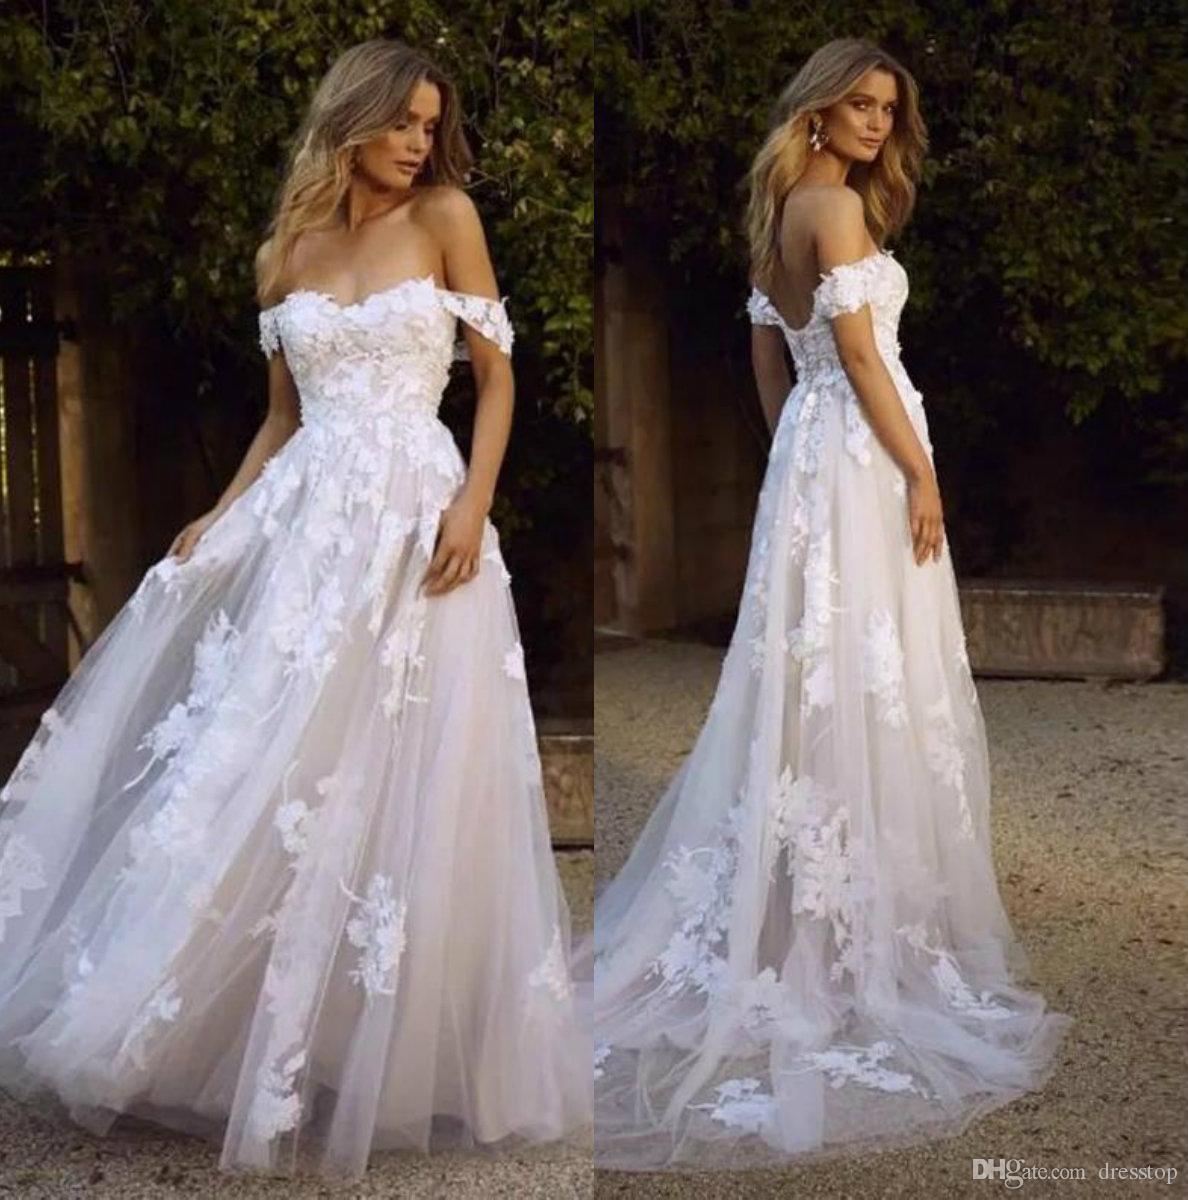 Discount Vintage 2019 White Wedding Dresses